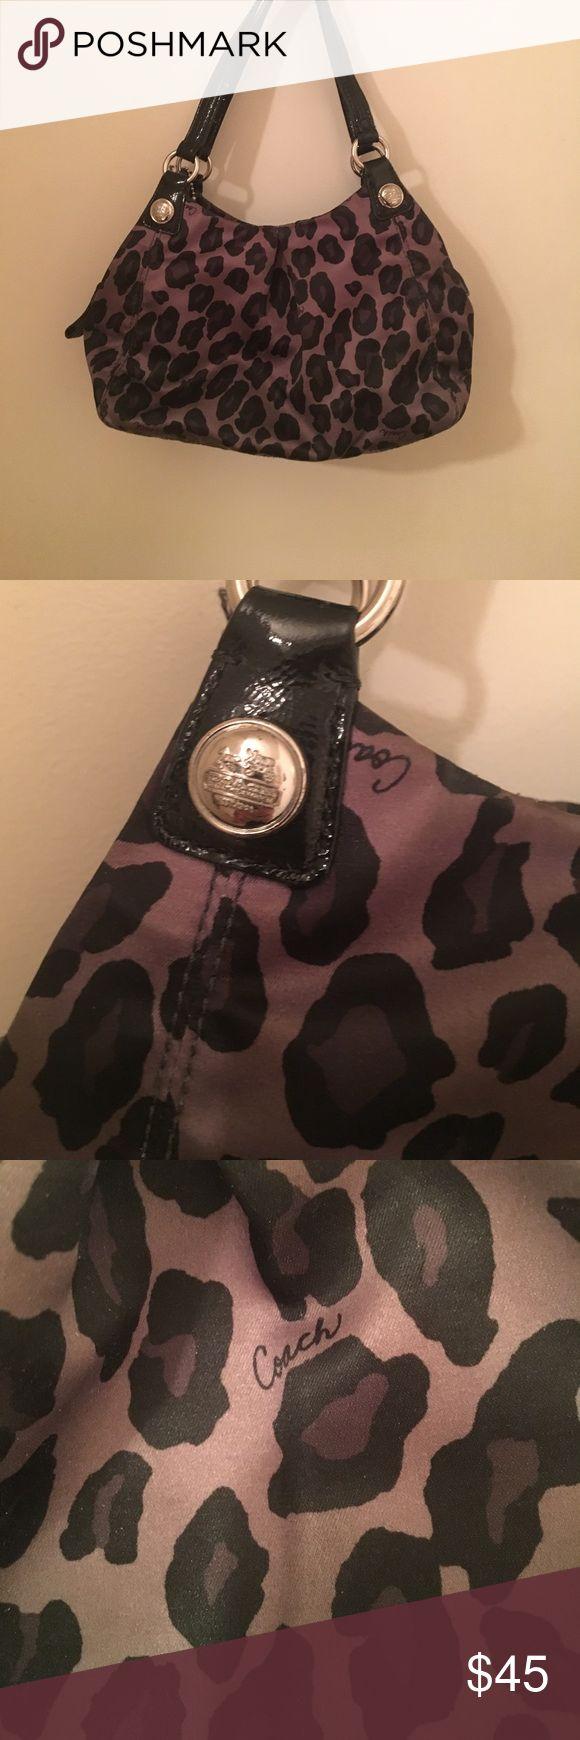 🛍MAKE AN OFFER🛍 Coach leopard purse Small authentic coach purse. Black and dark grey Coach Bags Mini Bags